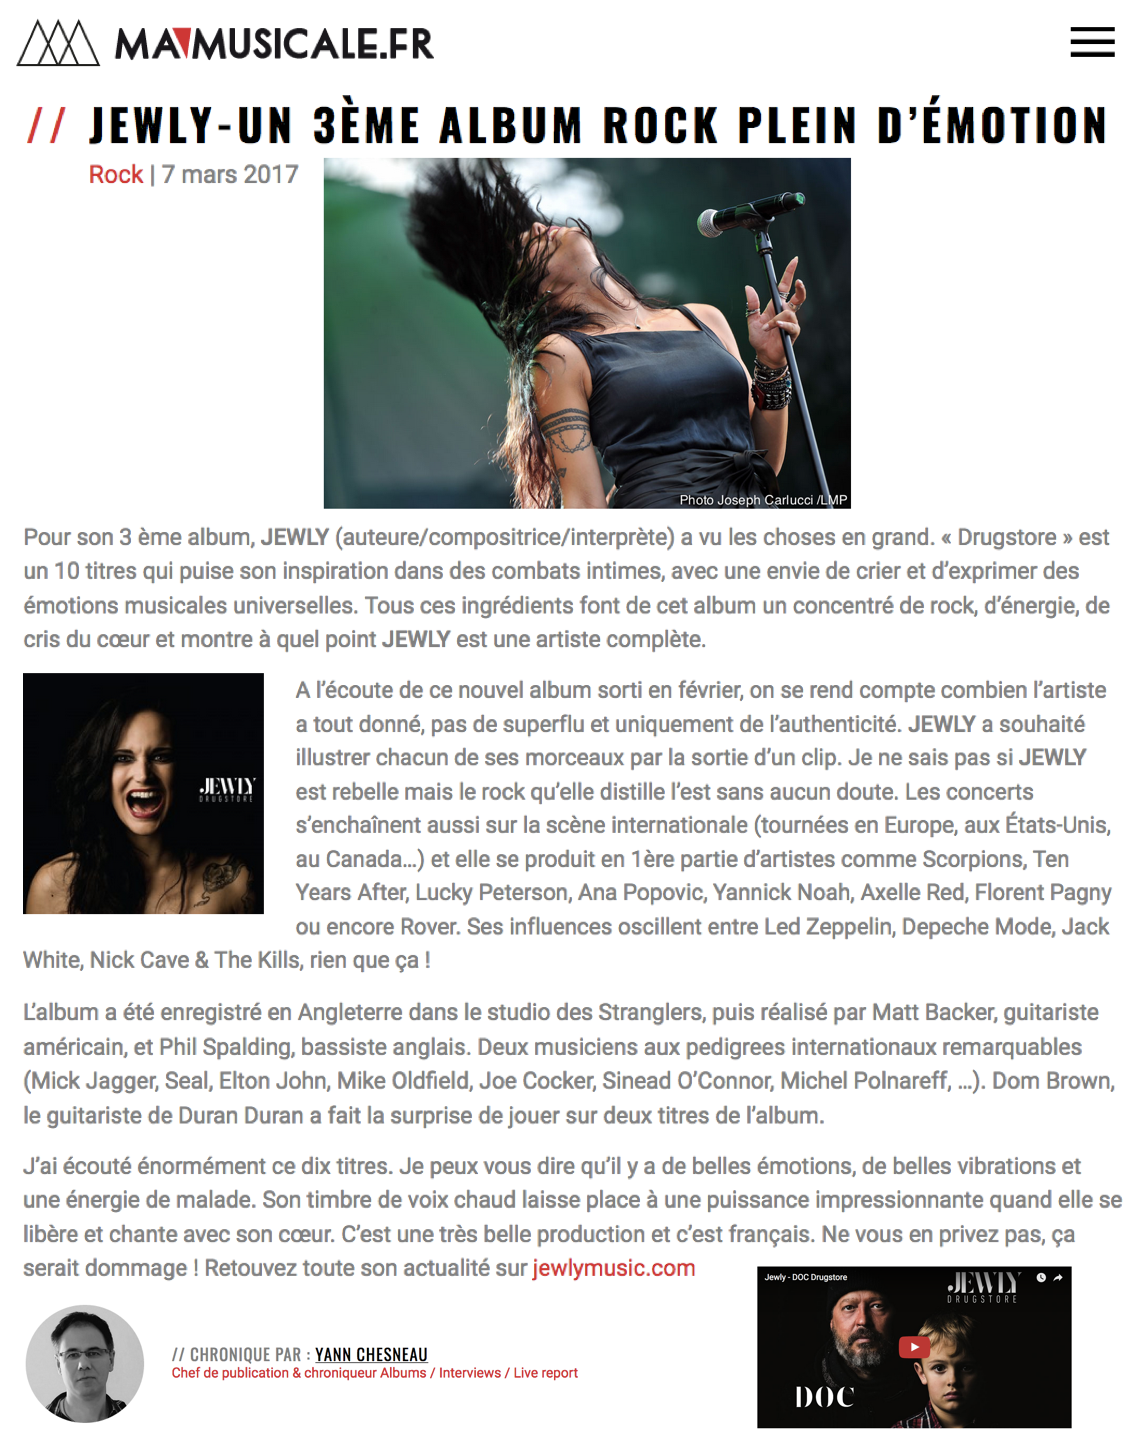 Ma Musicale - 07/03/2017